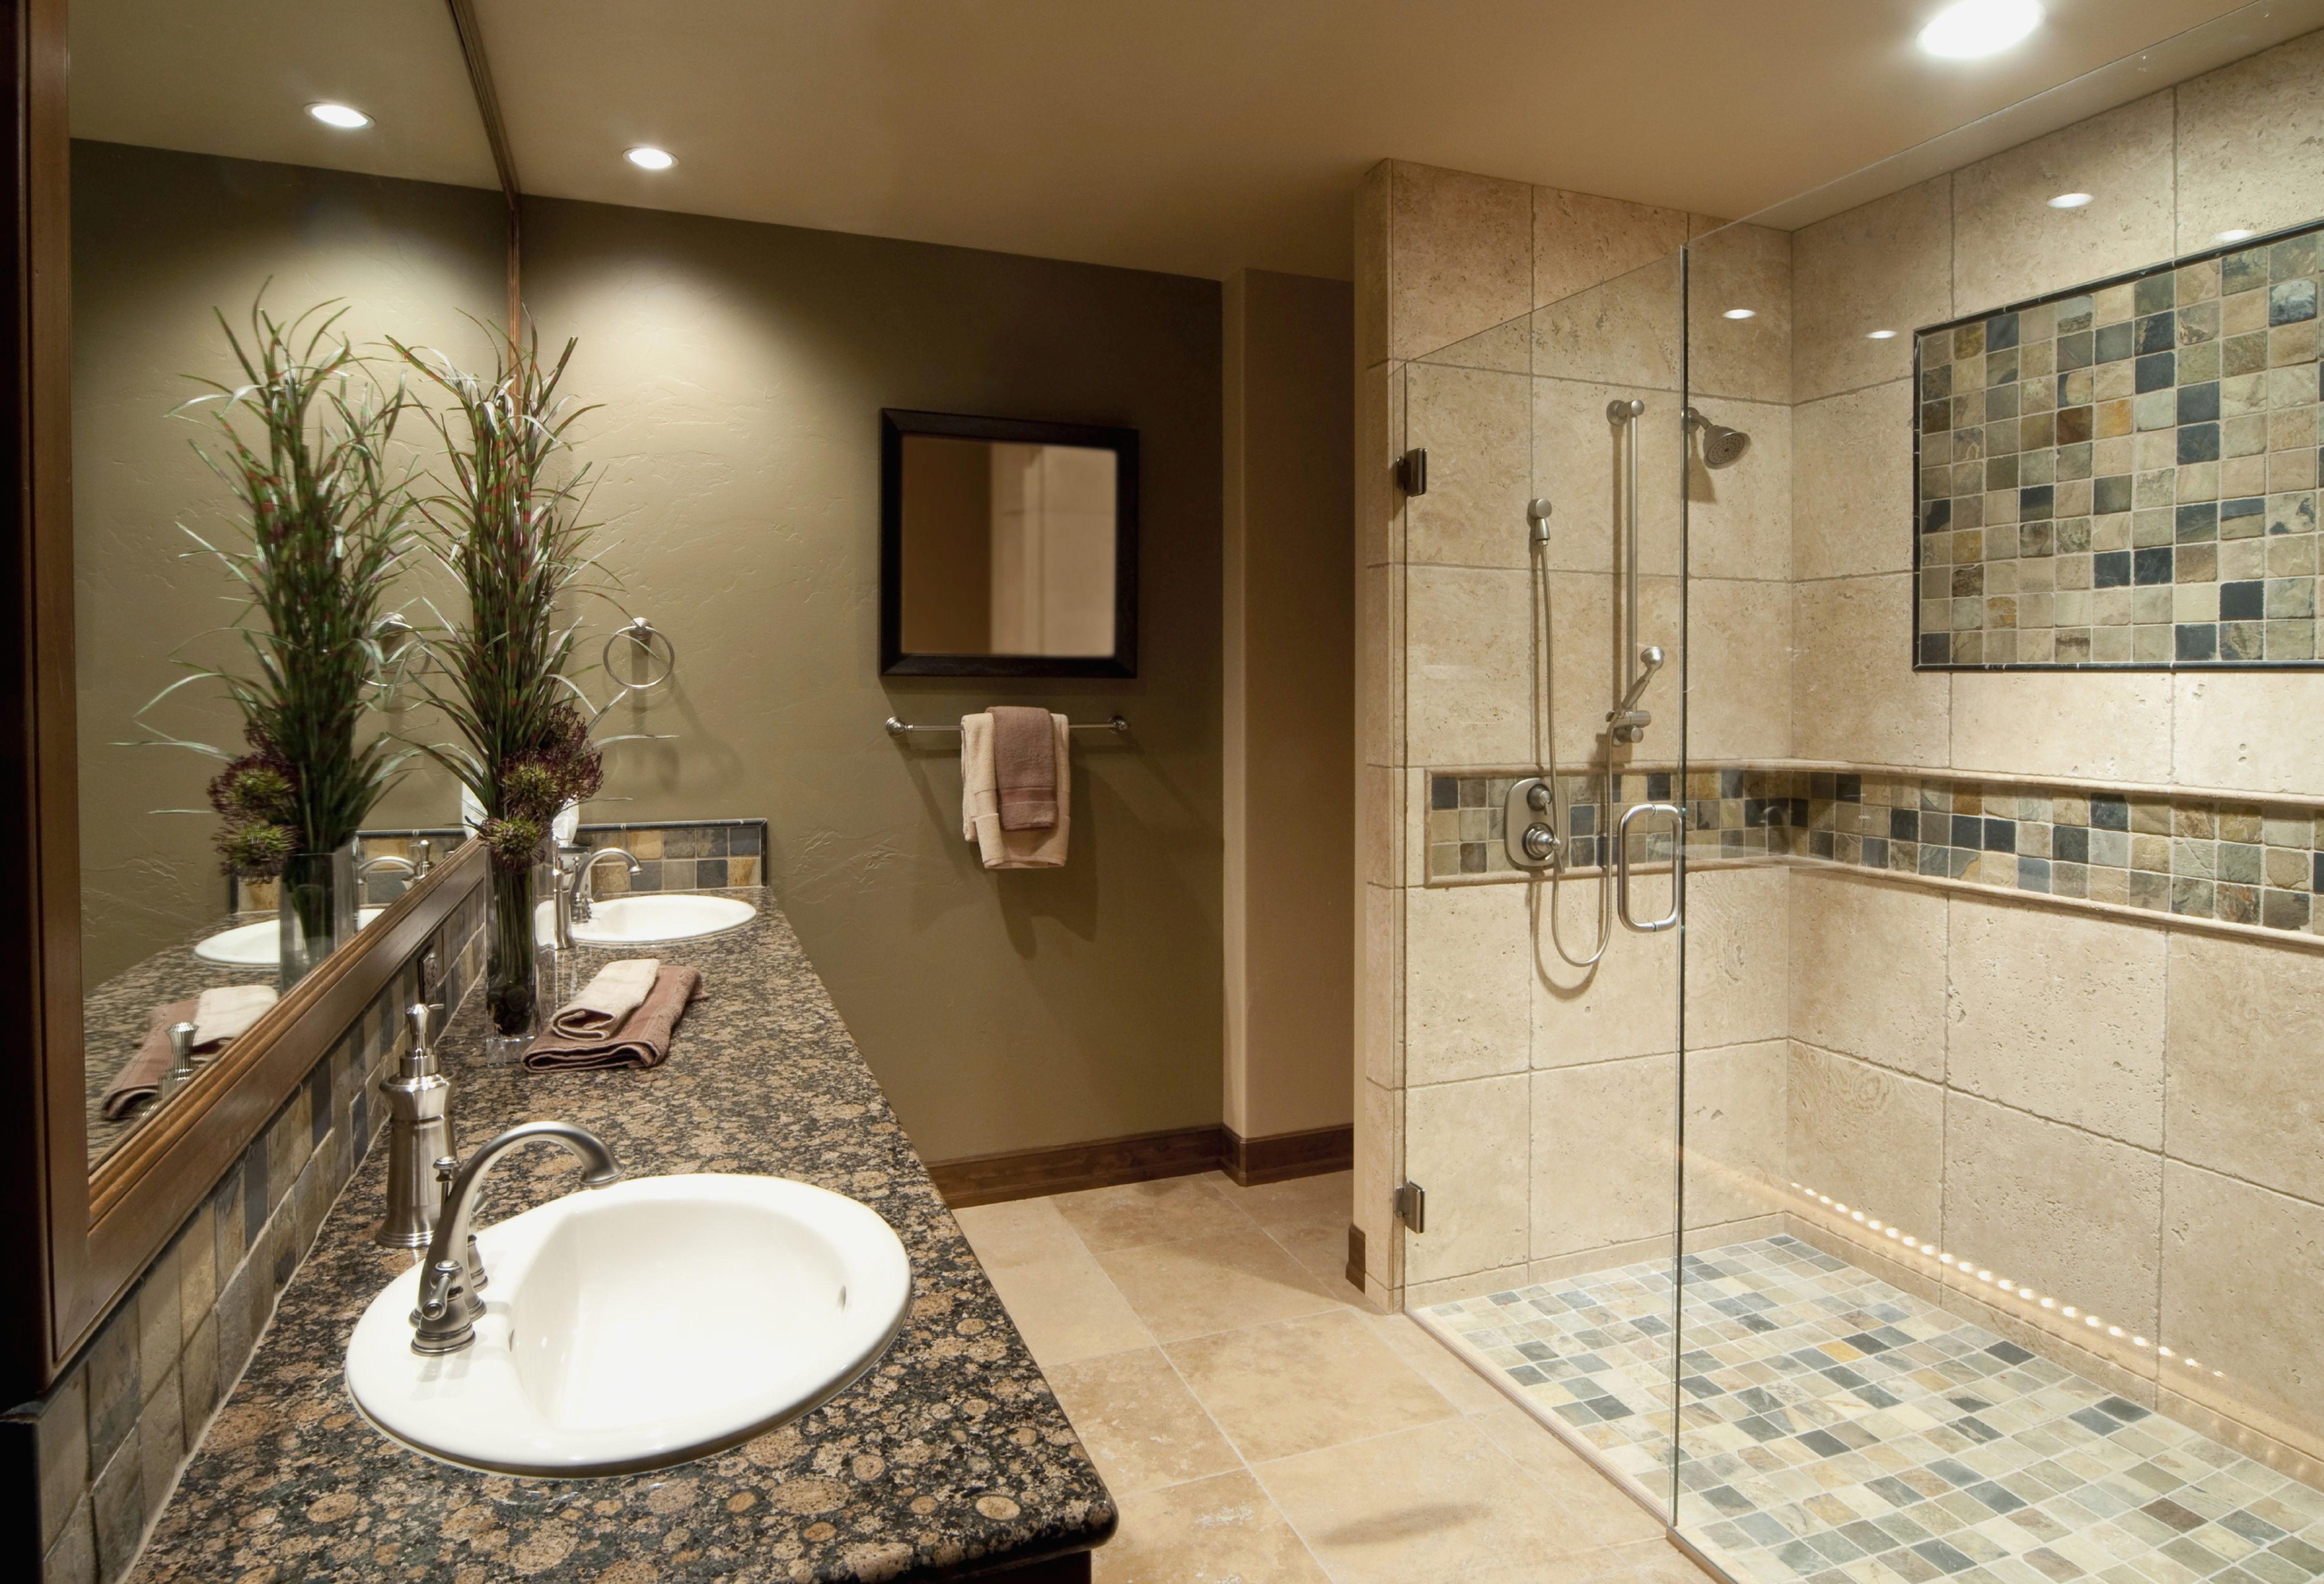 Average Cost Of Bathroom Remodel Contemporary Bathroom Remodel Average Cost for Bathroom Remodel Decorations Décor